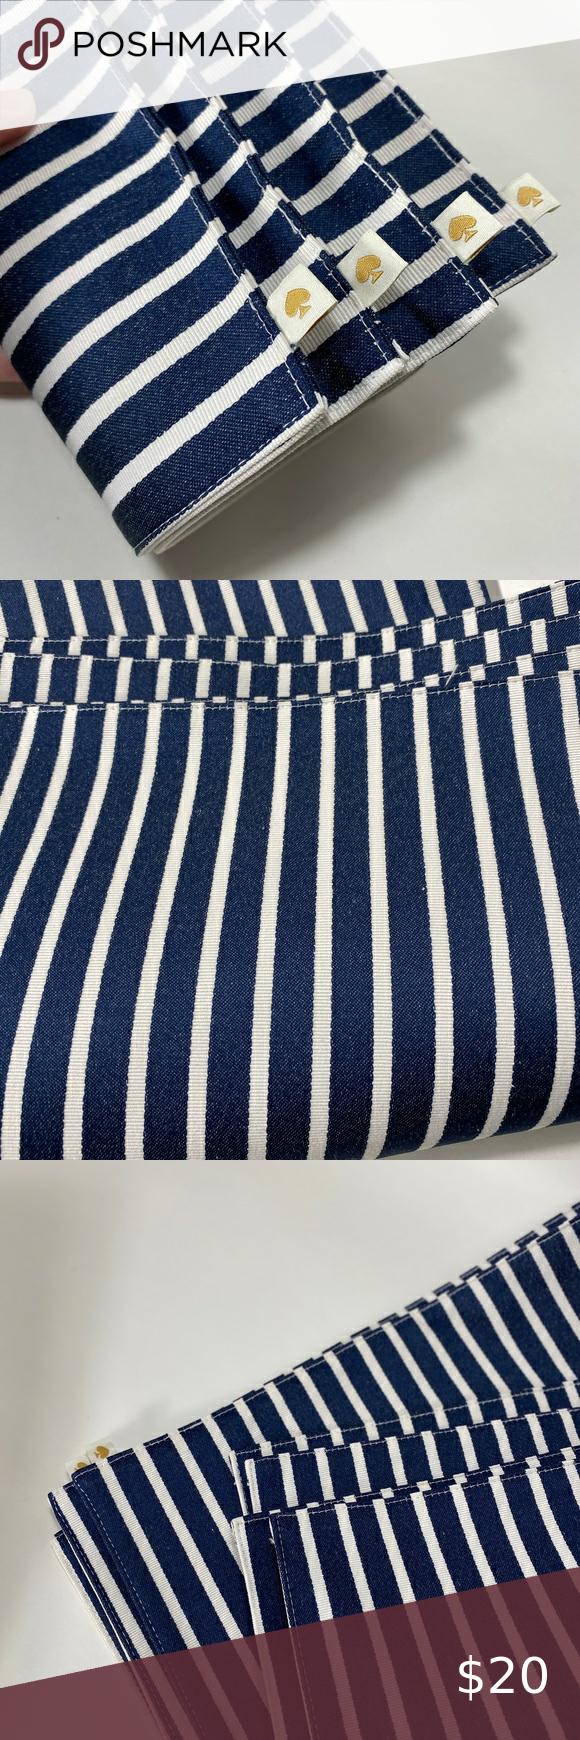 4x Kate Spade Blue White Striped Placemats Blue And White White Stripe Kate Spade